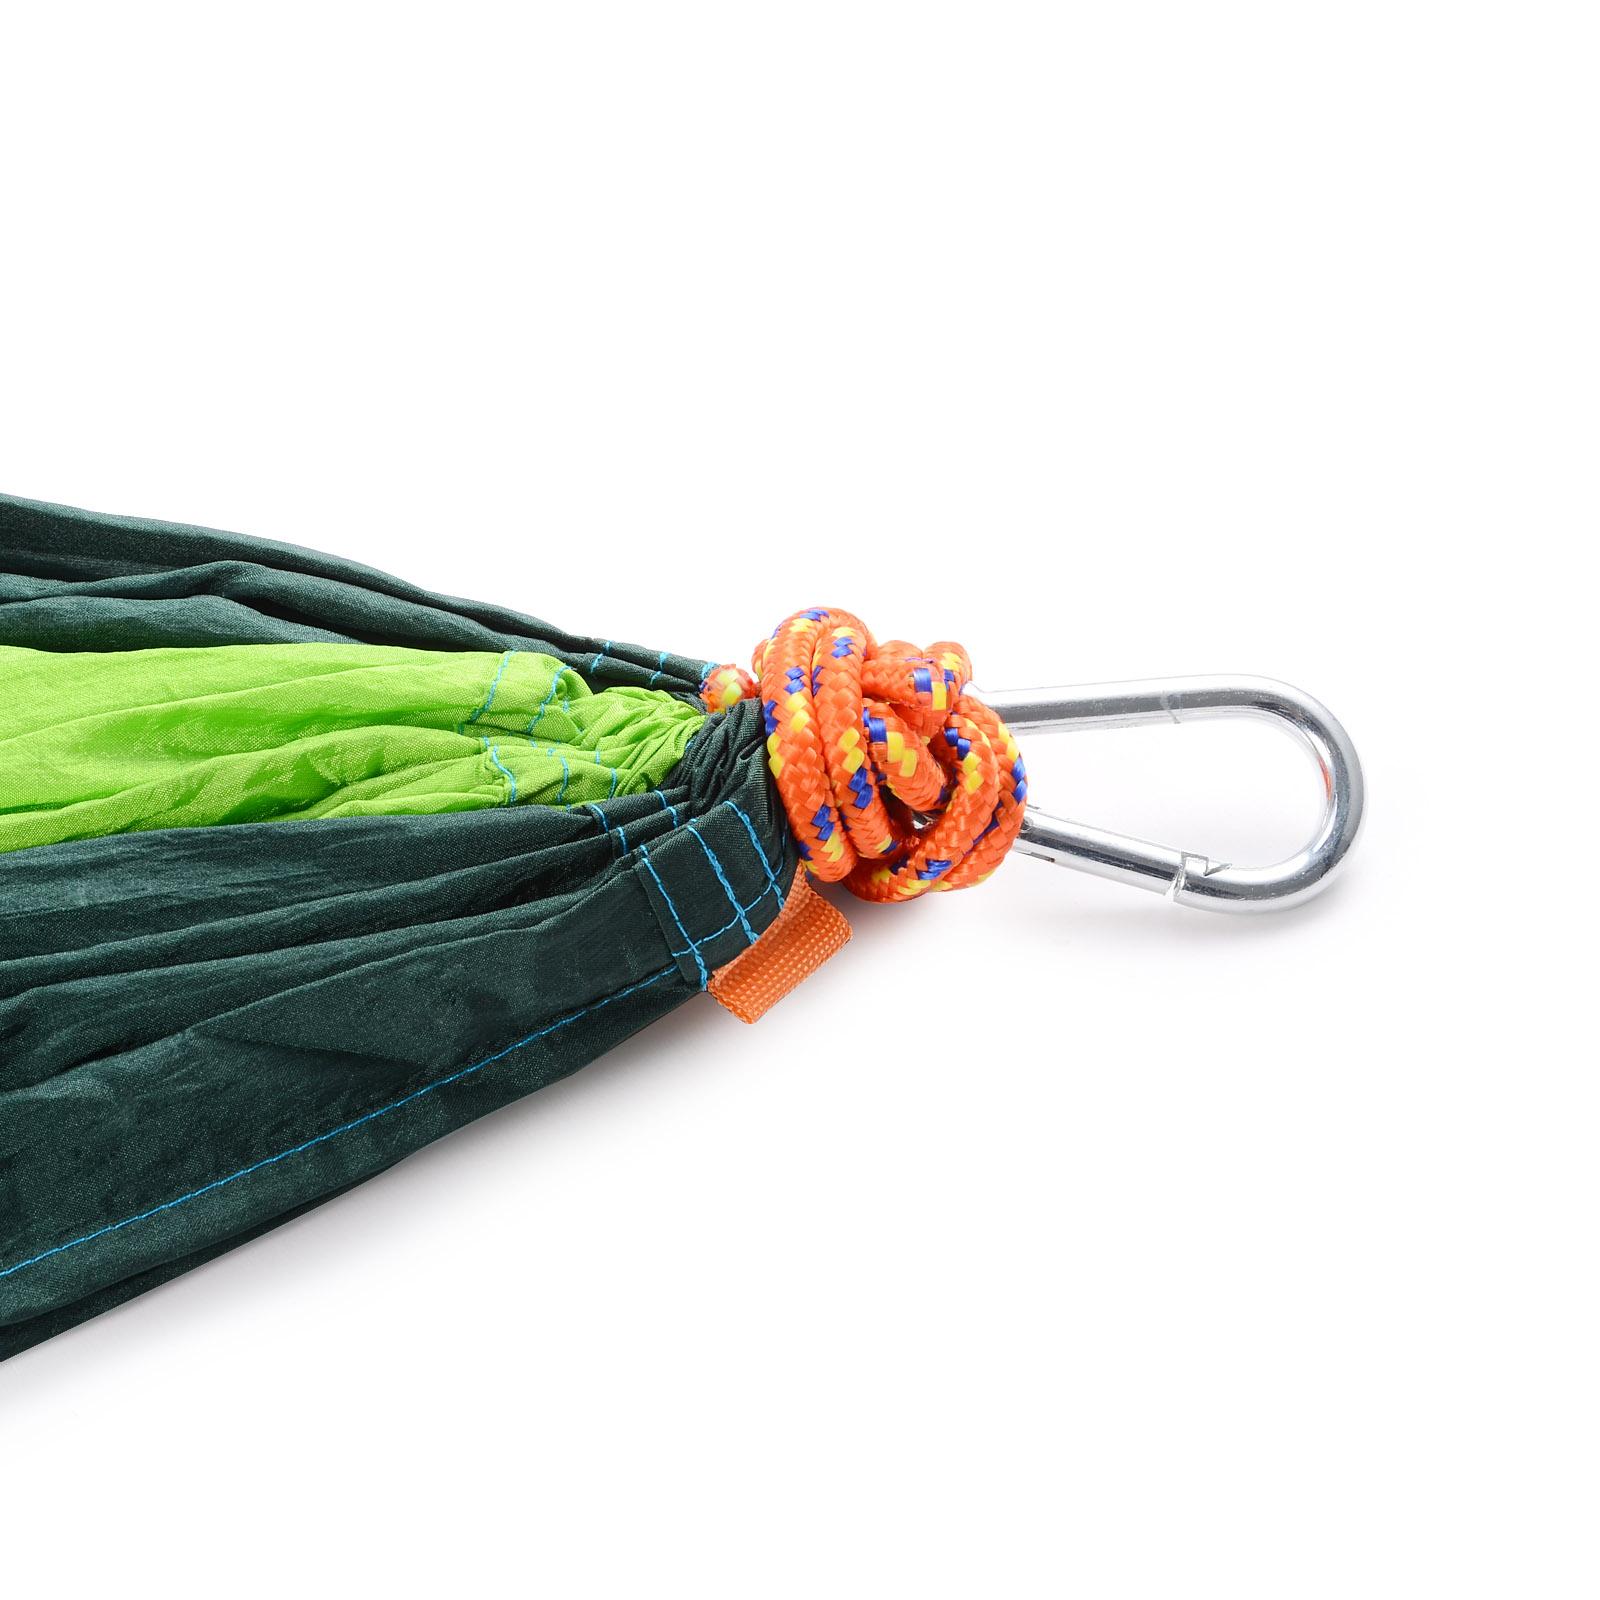 Tissu en nylon parachute